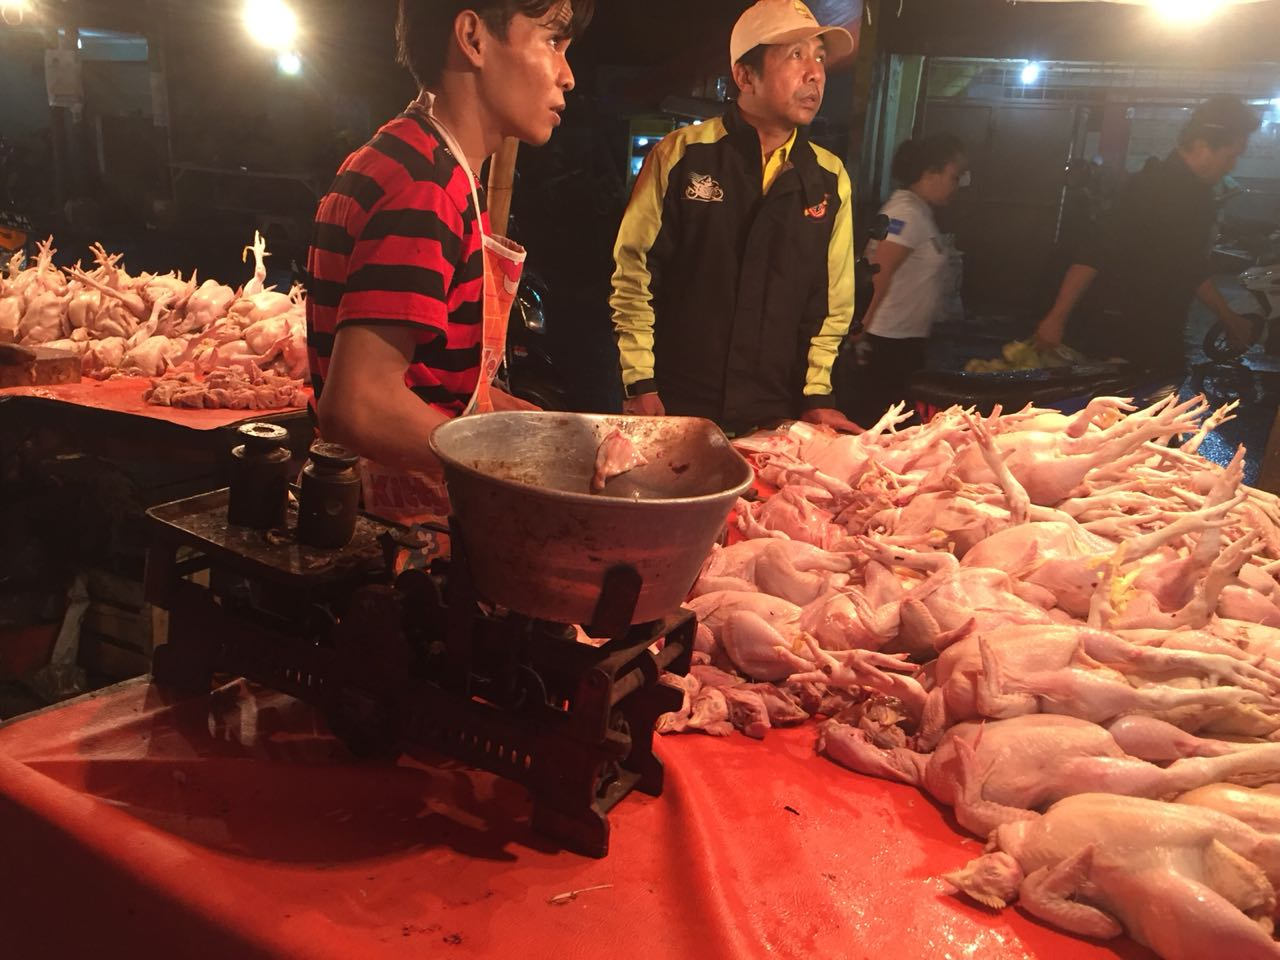 https: img-z.okeinfo.net content 2018 06 14 320 1910371 besok-lebaran-harga-daging-ayam-meroket-jadi-rp50-000-kg-uY4zFOKuhR.jpg